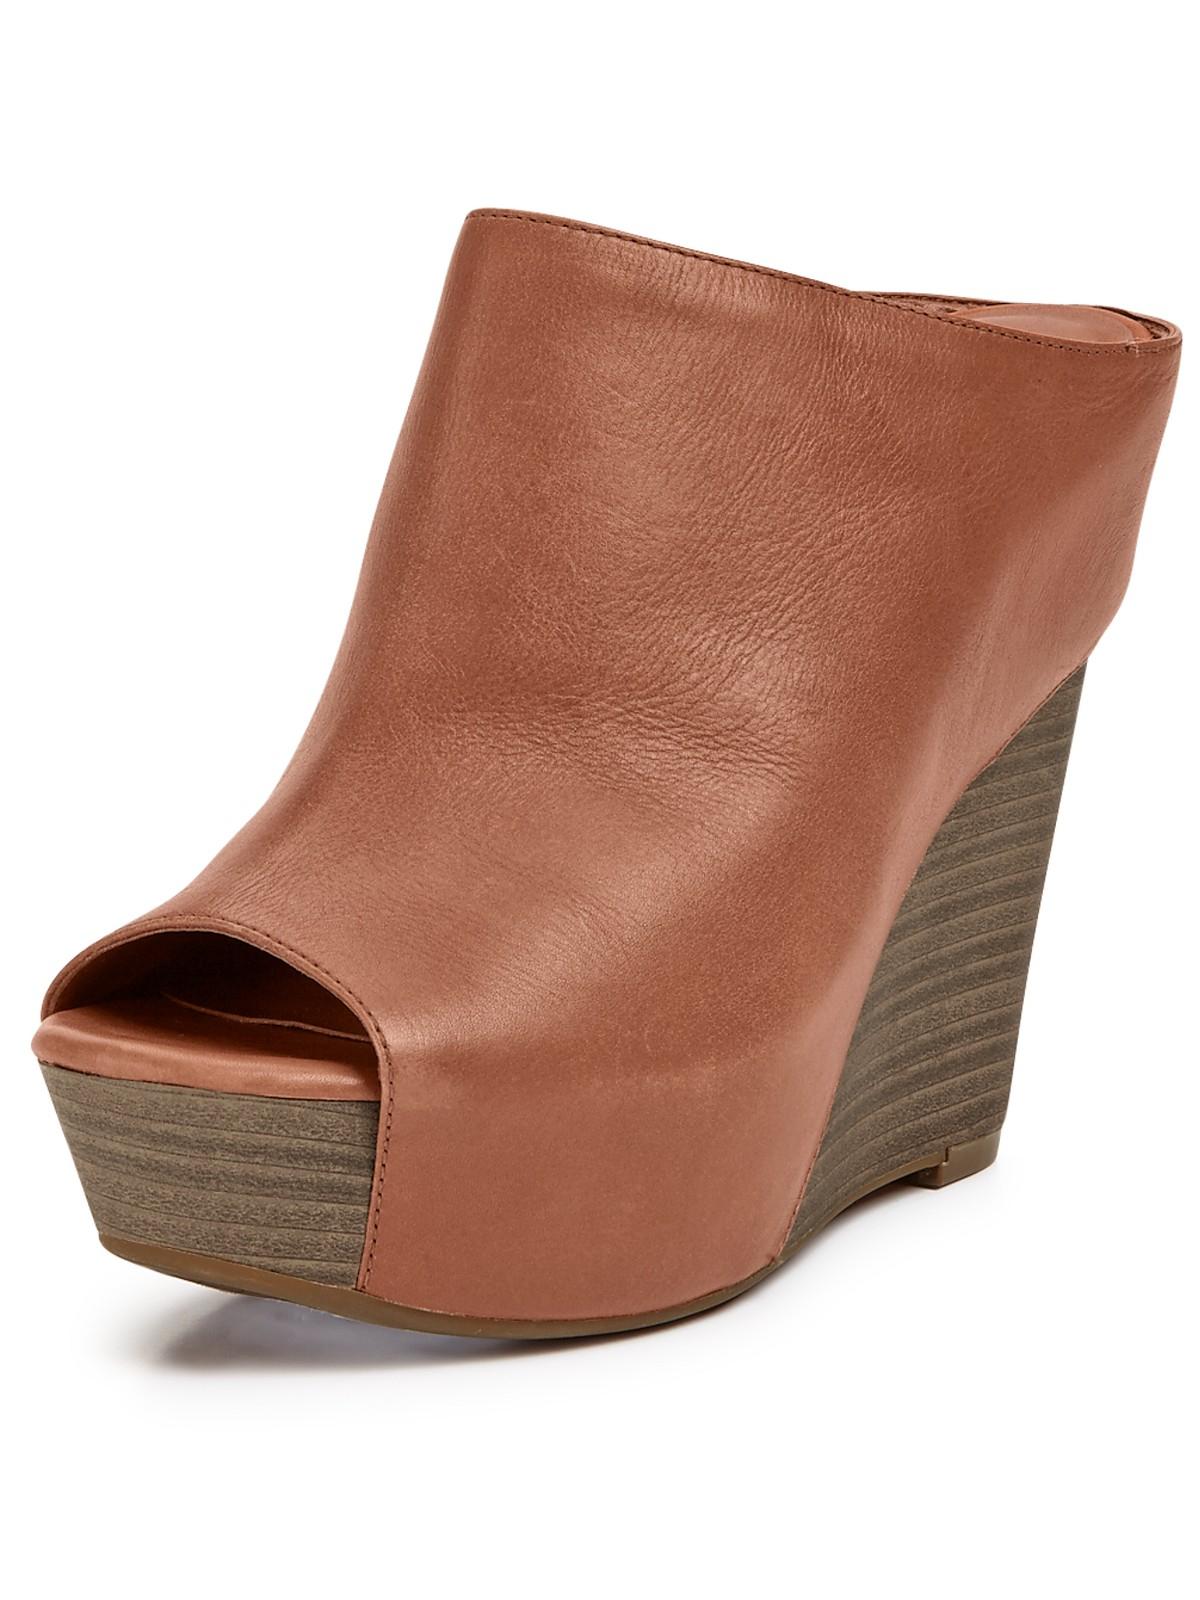 Wedge Sandals Steve Madden Jessica simpson Laurin...